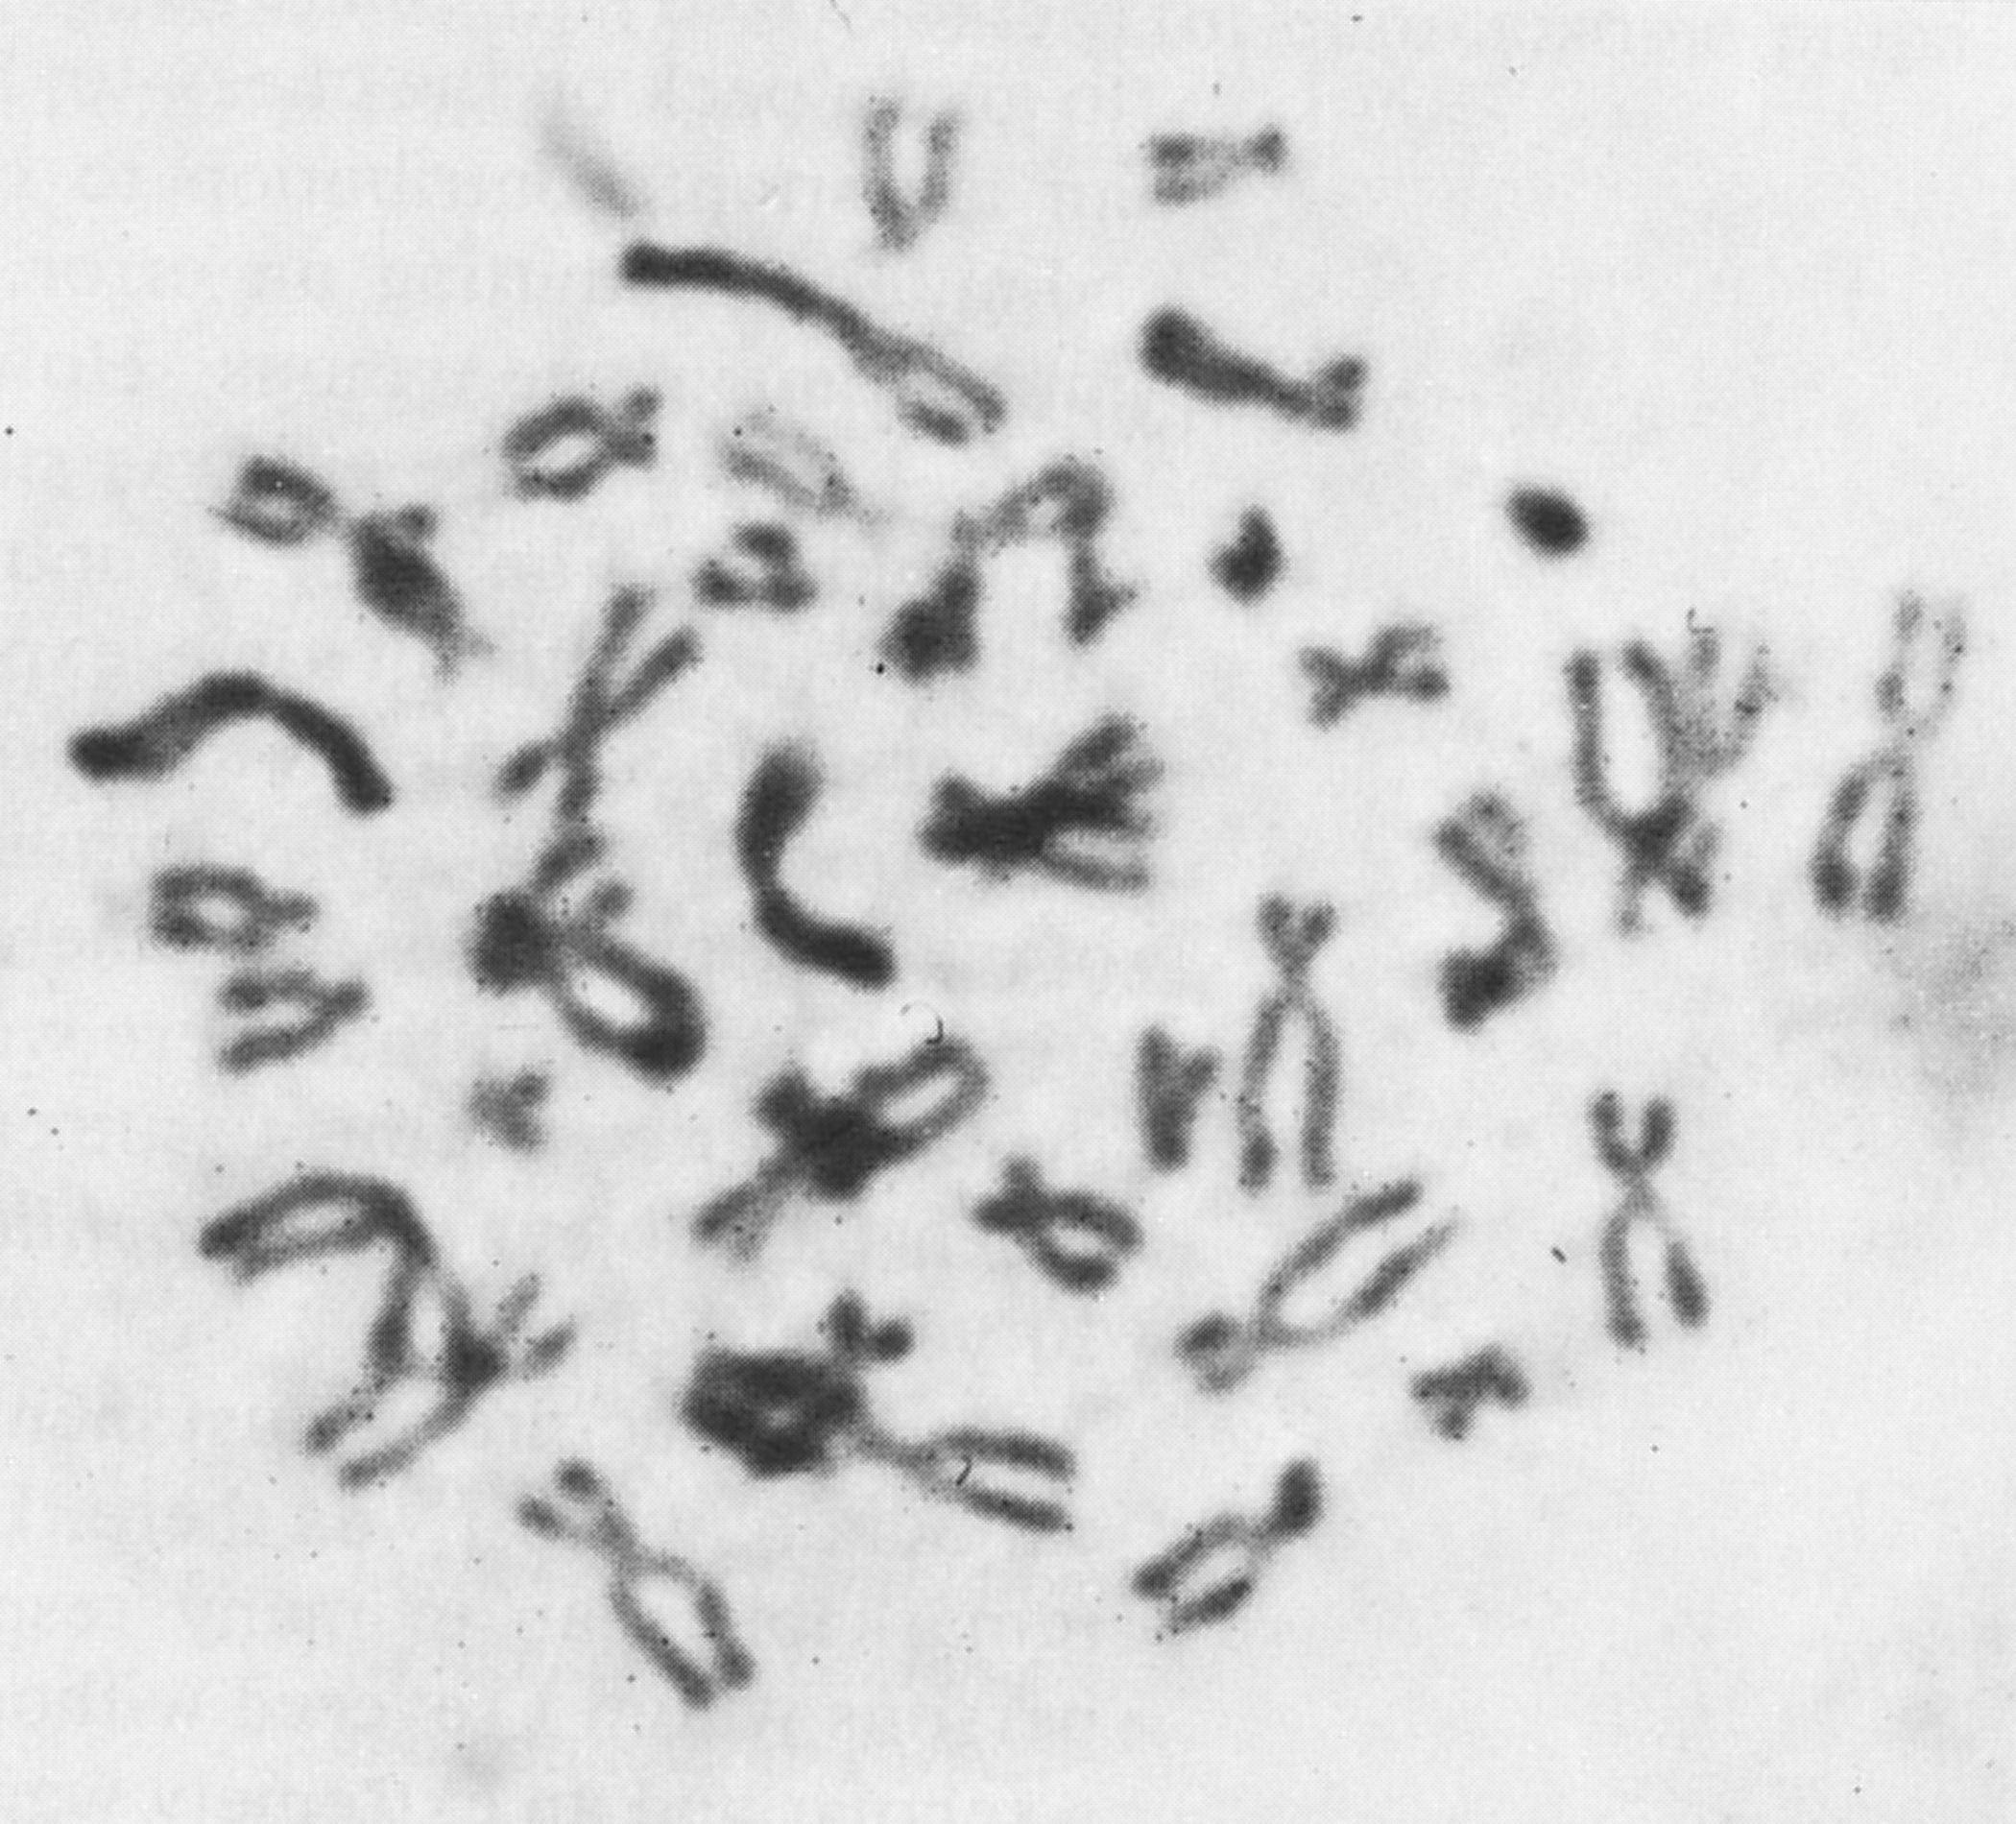 Human Karyotypes